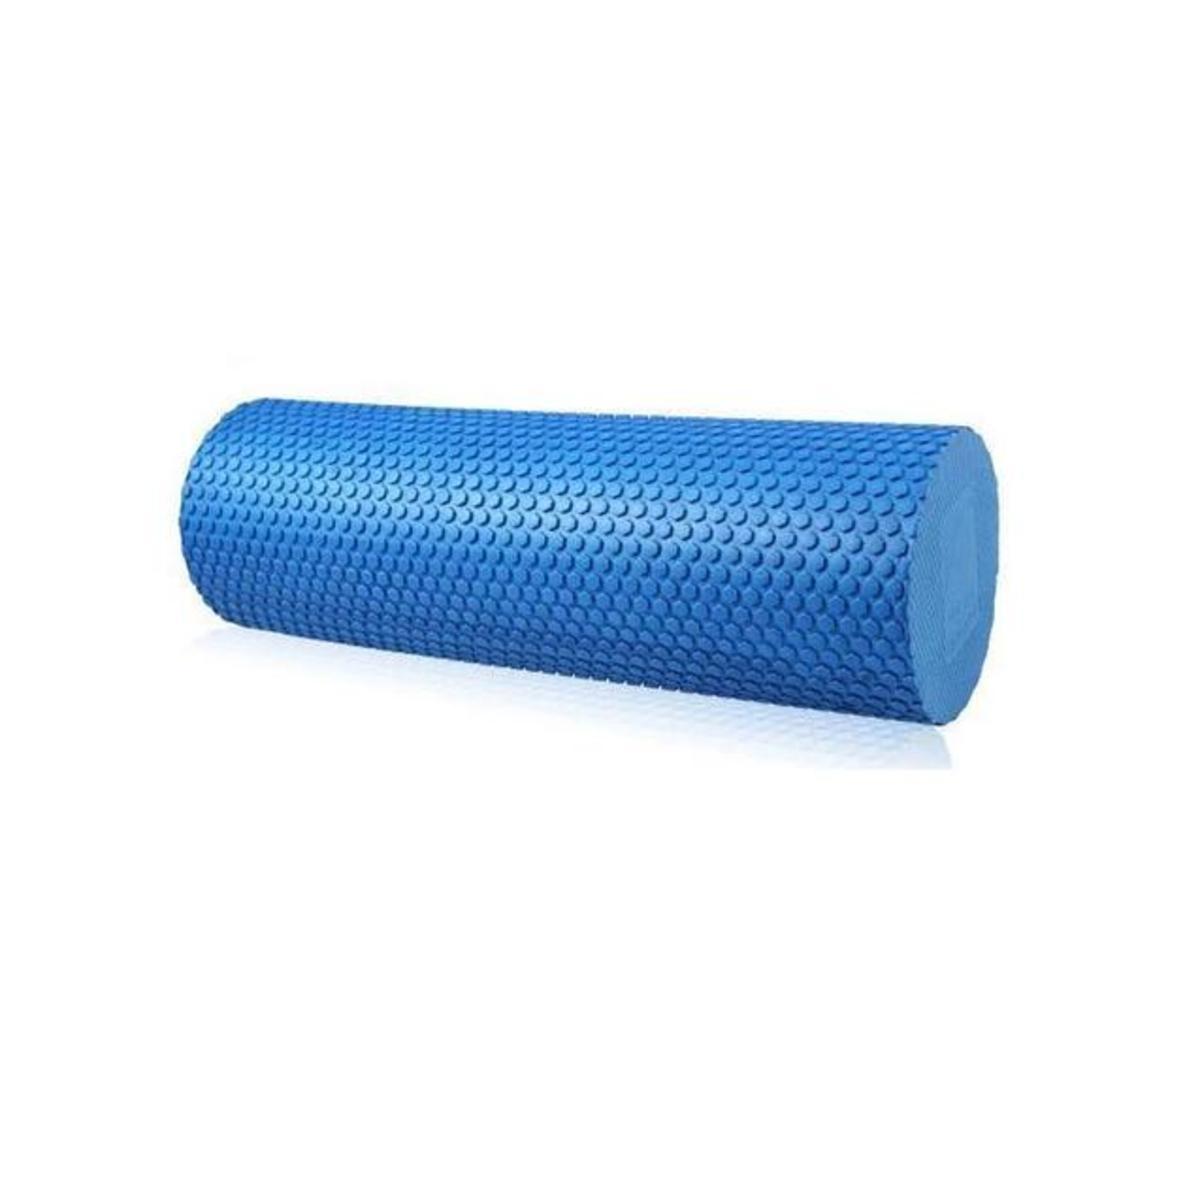 EVA實心浮點瑜伽柱 瑜伽棒 (粉/藍/紫) - 藍色